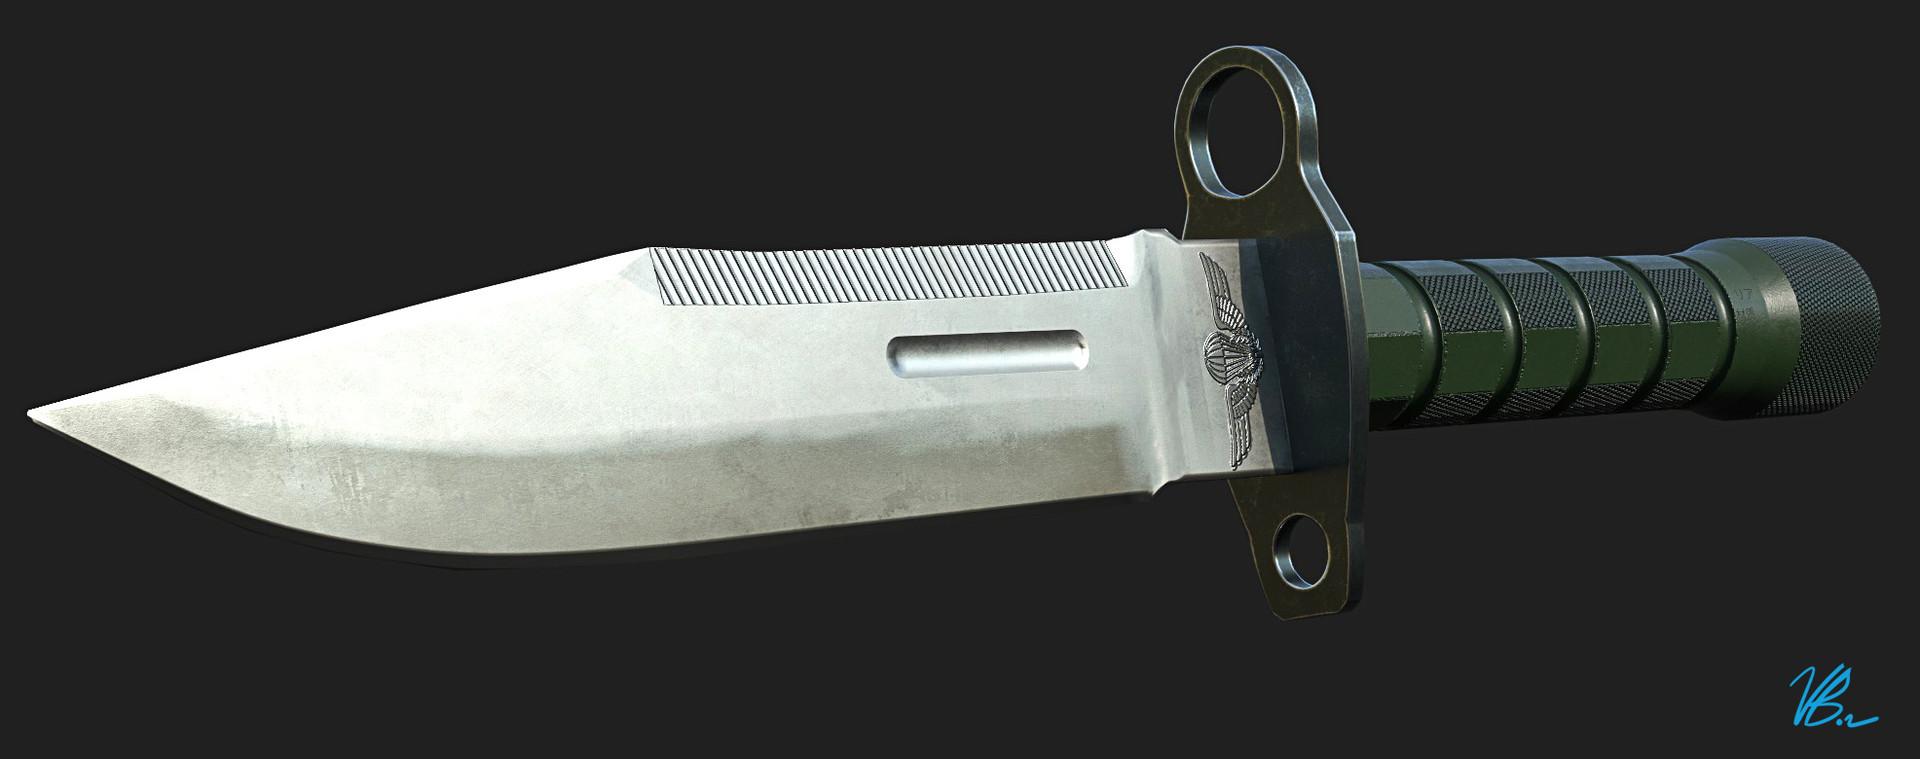 Vitor borsato phrobis knife 01 final